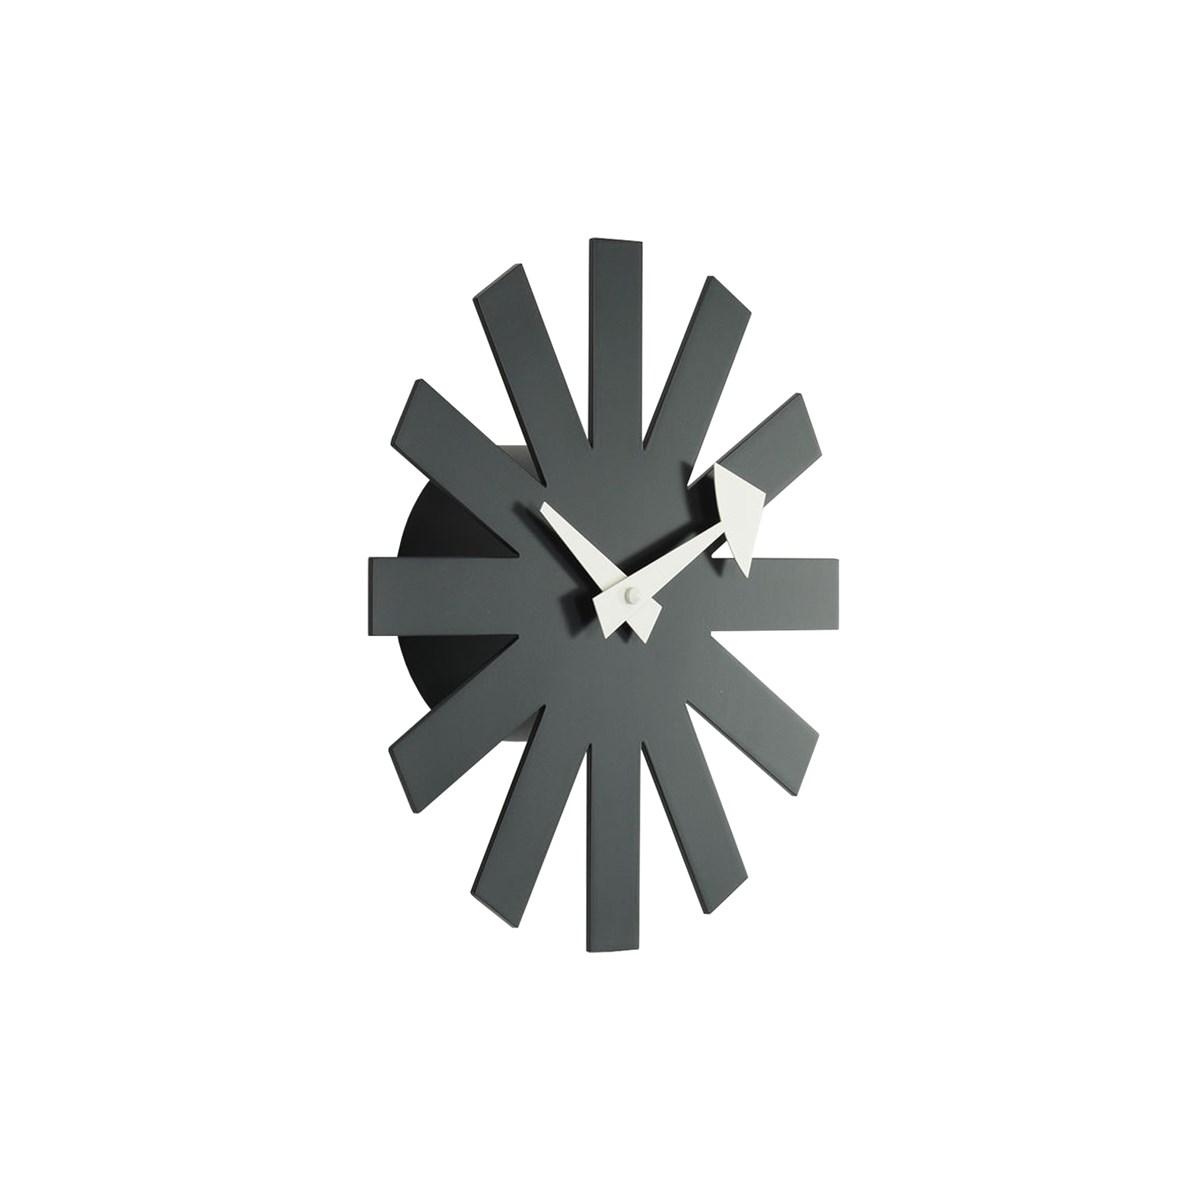 Vitra-George-Nelson-Asterisk-Wall-Clock-Matisse-1